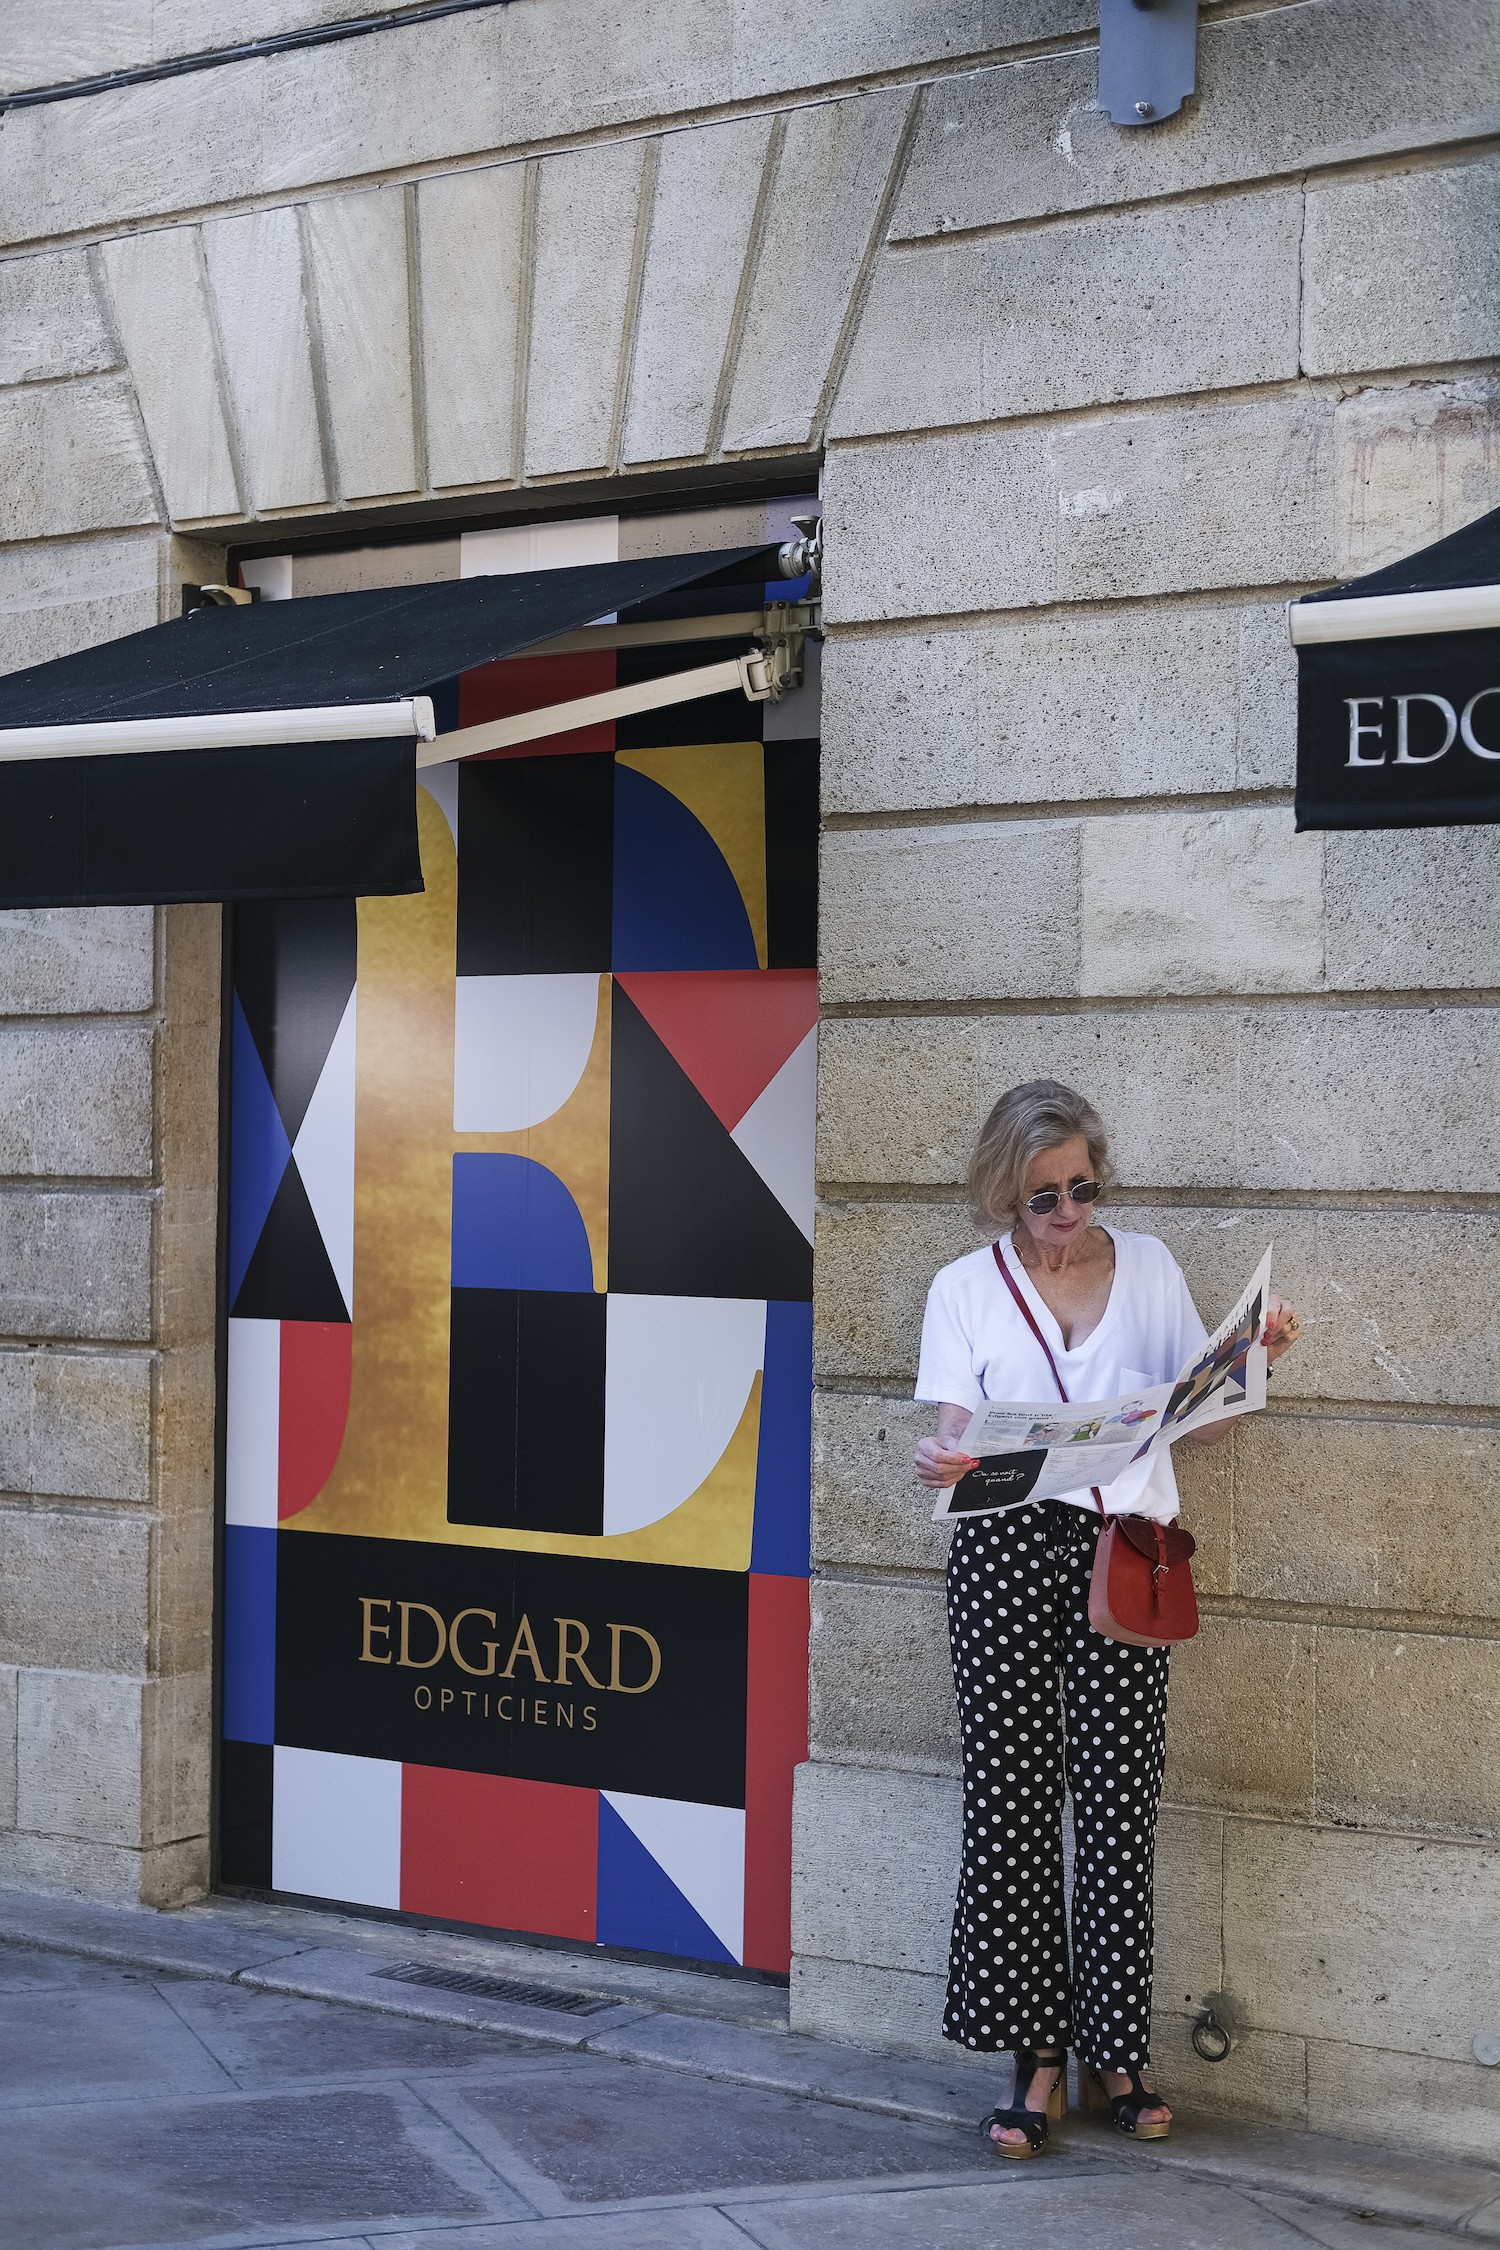 EDGARD OPTICIENS